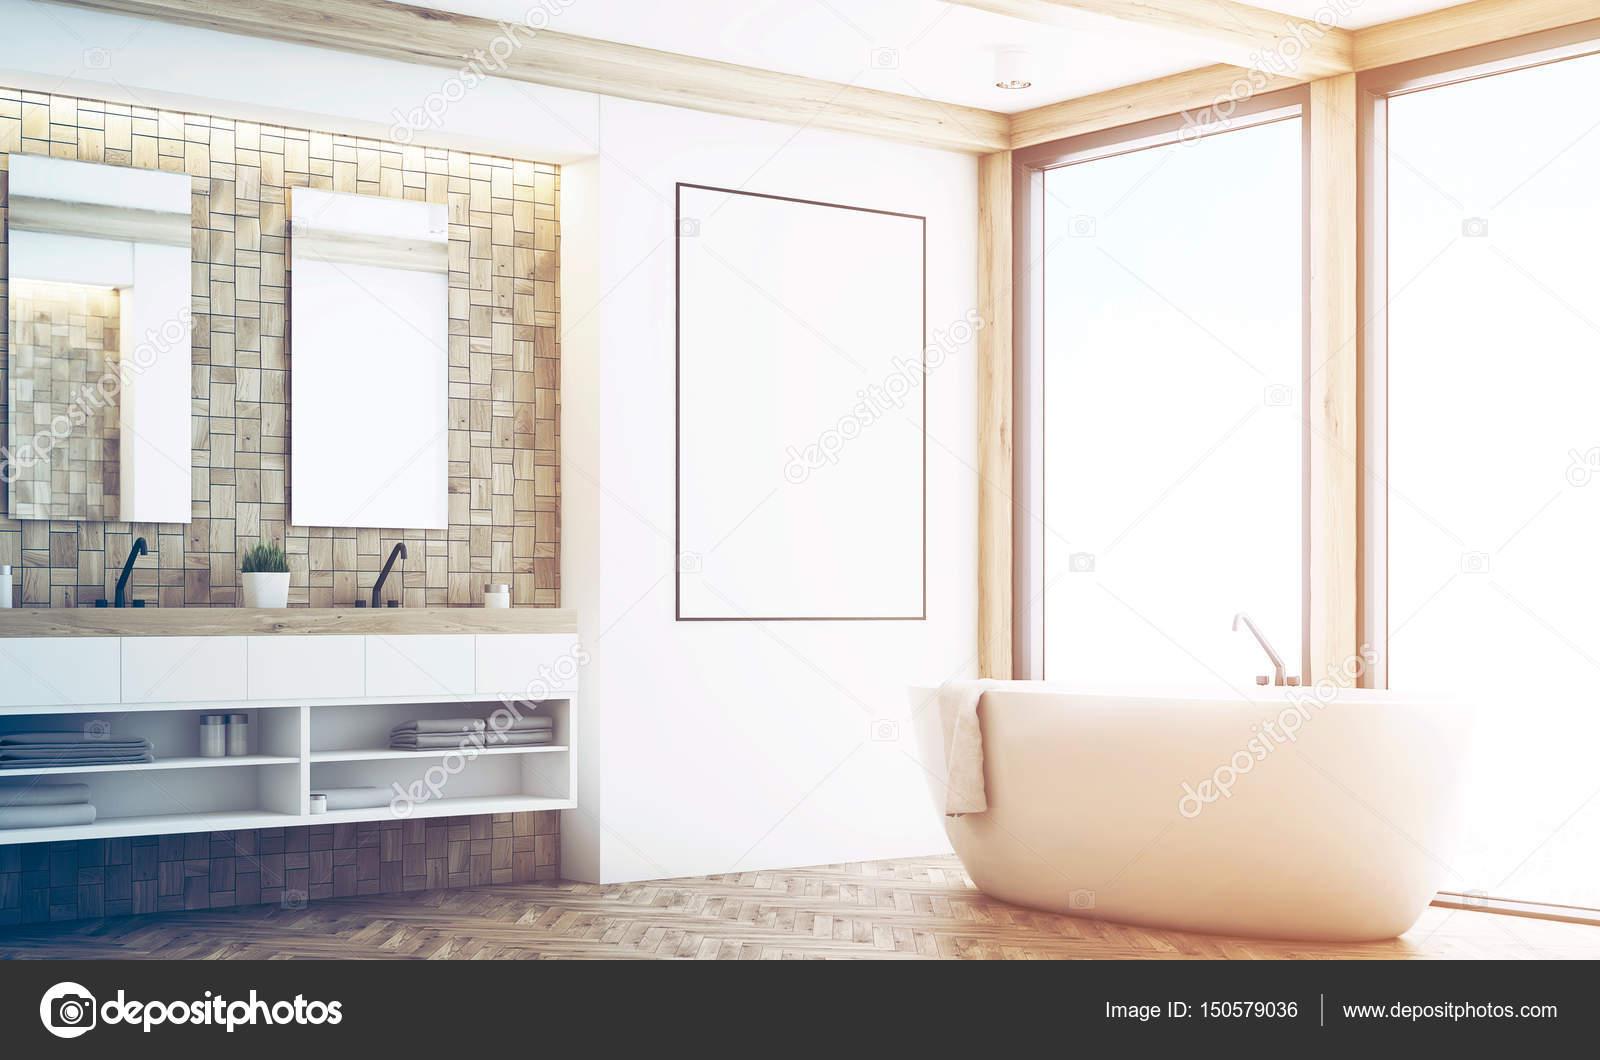 Badkamer Lichte Tegels : Lichte tegels badkamer poster hoek afgezwakt u stockfoto